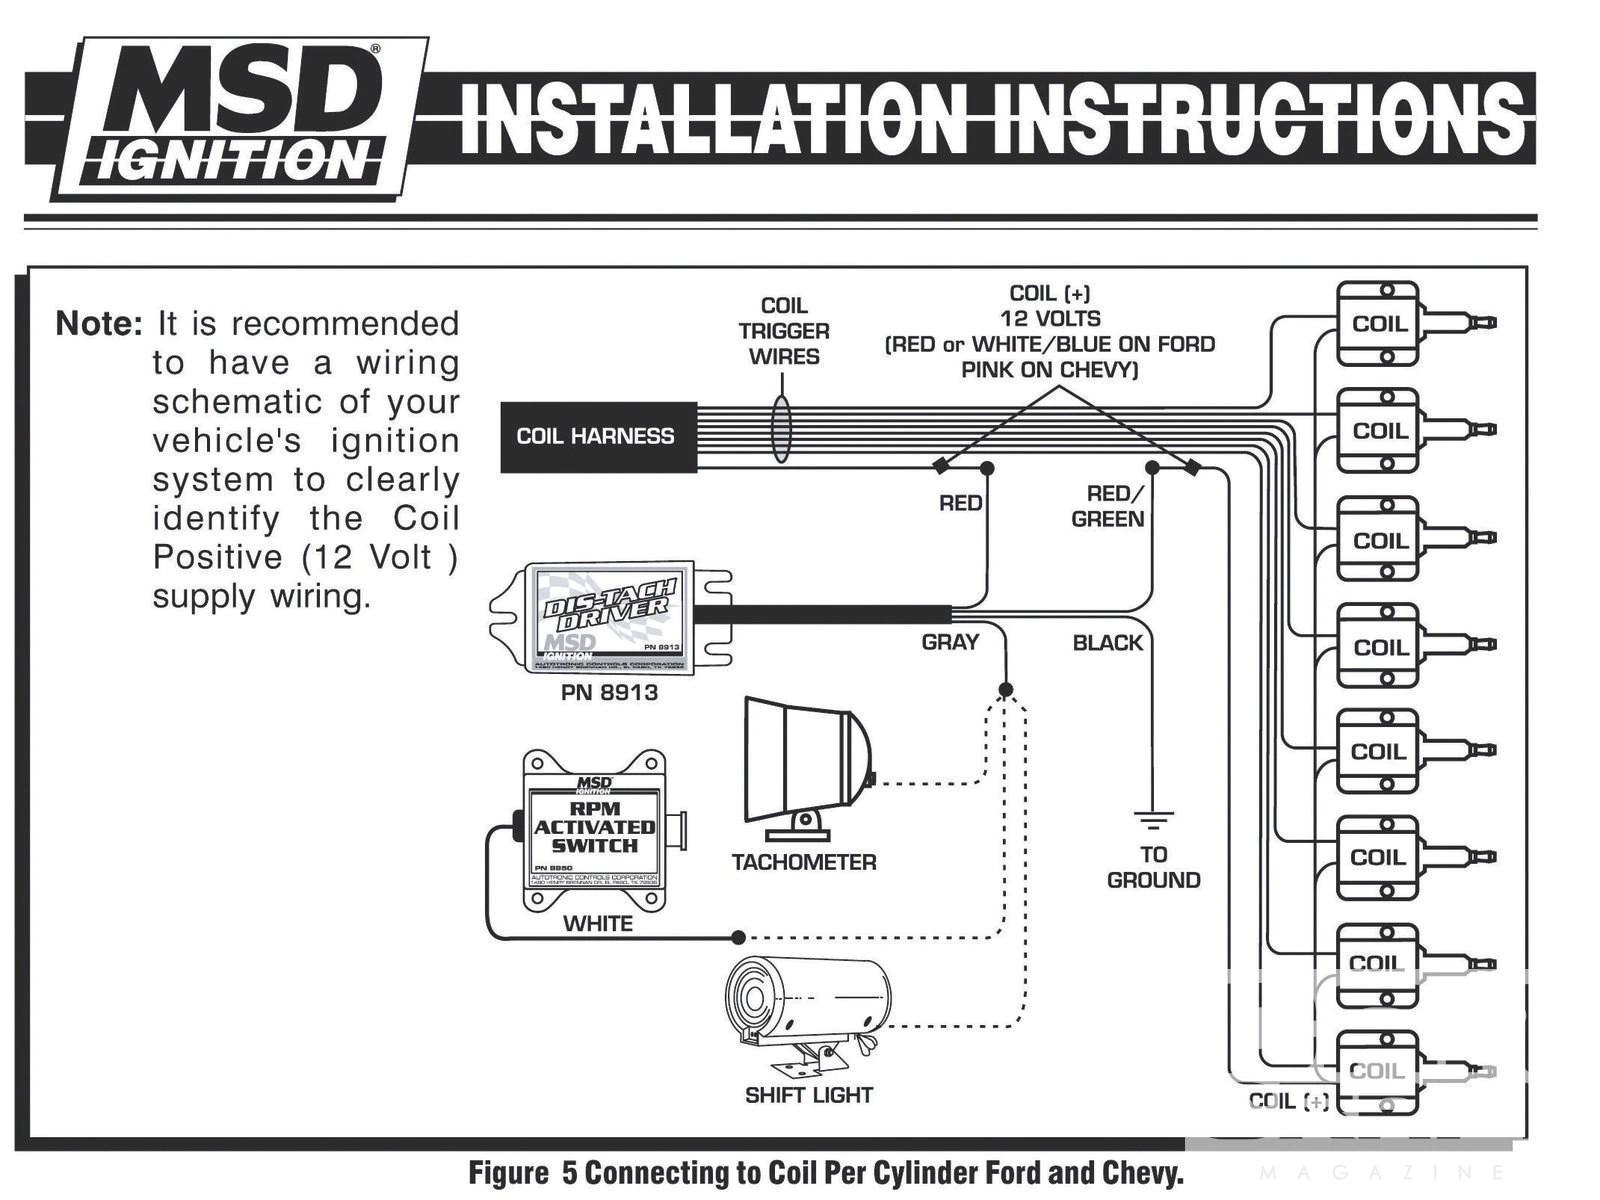 Billedresultat For Ultima Ignition Ledningsnet T Motor Wiring Diagram Amazing Symbols Of Drawing